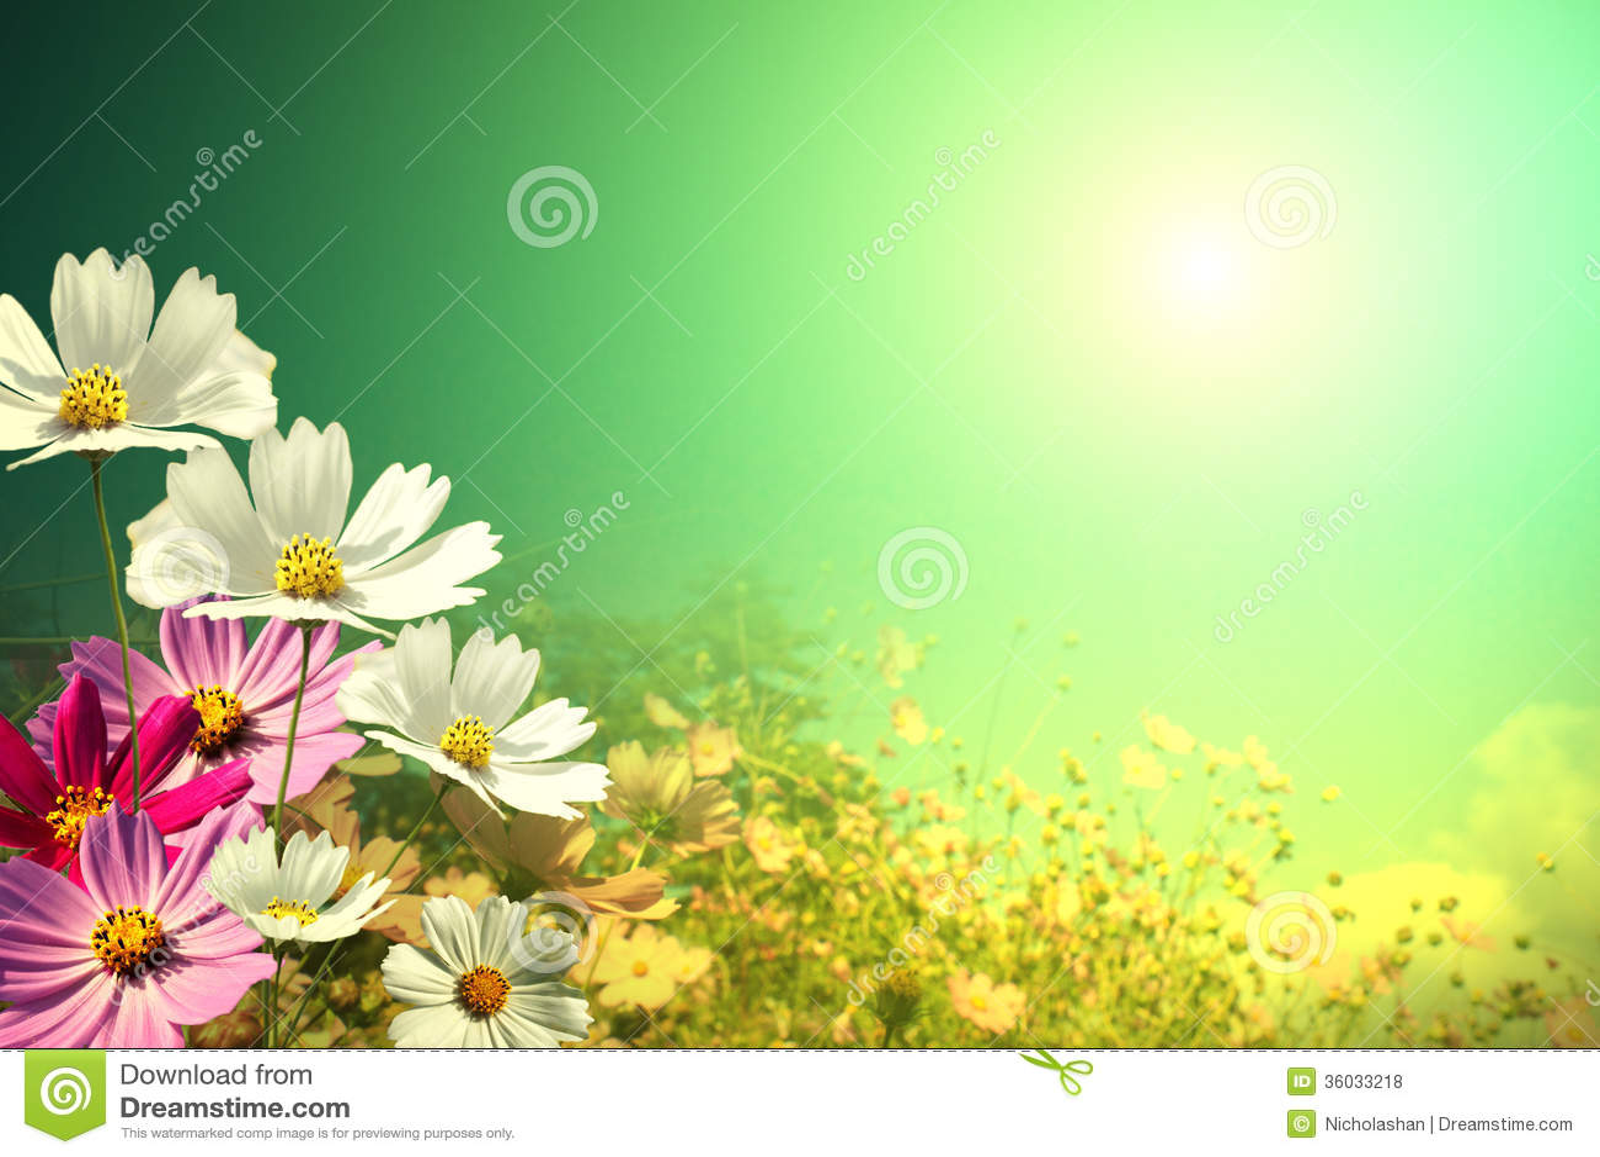 Field of daisy flowers stock photo image of chamomile 36033218 field of daisy flowers for adv or others purpose use izmirmasajfo